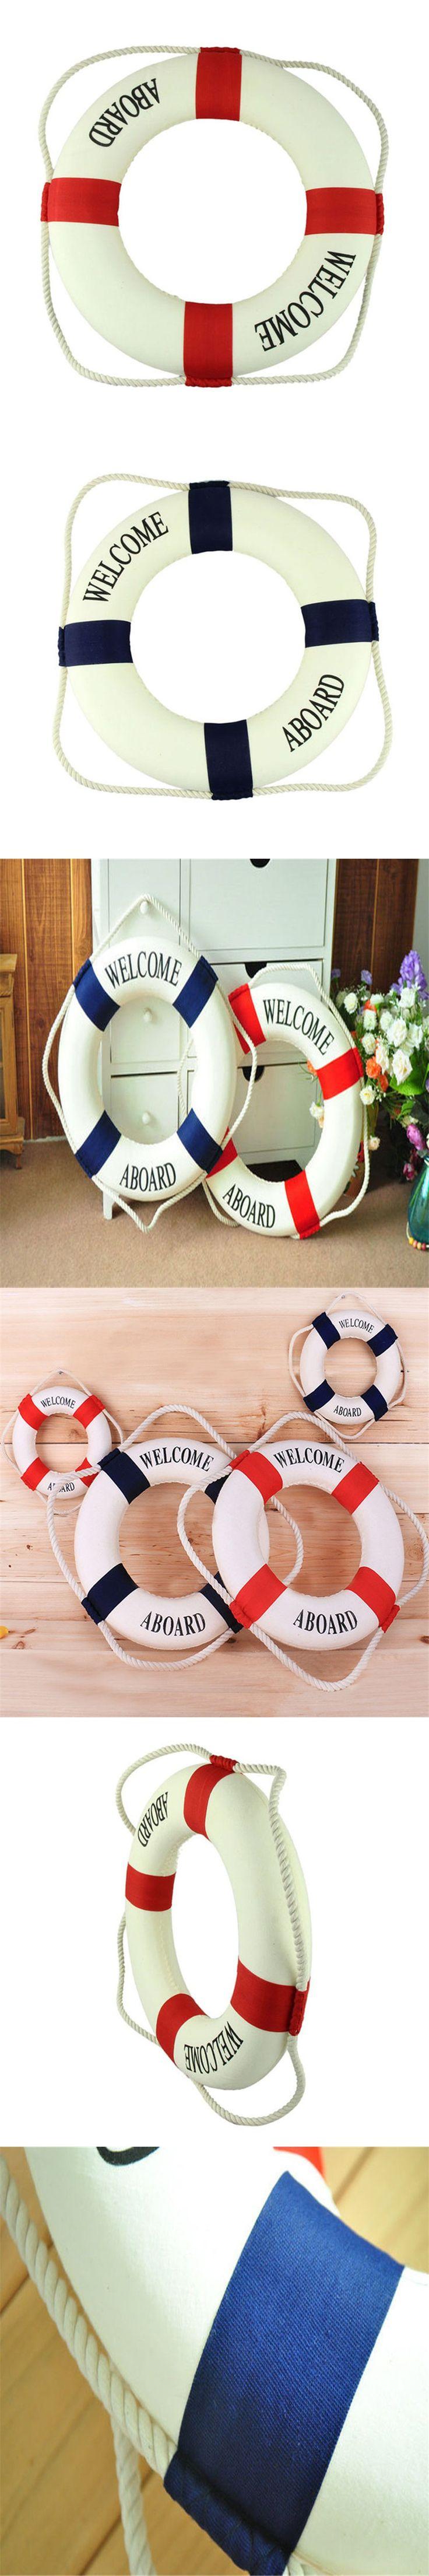 Welcome aboard boat ships life ring clock - Zero 35cm Lifebuoy Preserver Nautical Ship Boat Marine Theme Home Wall Decor